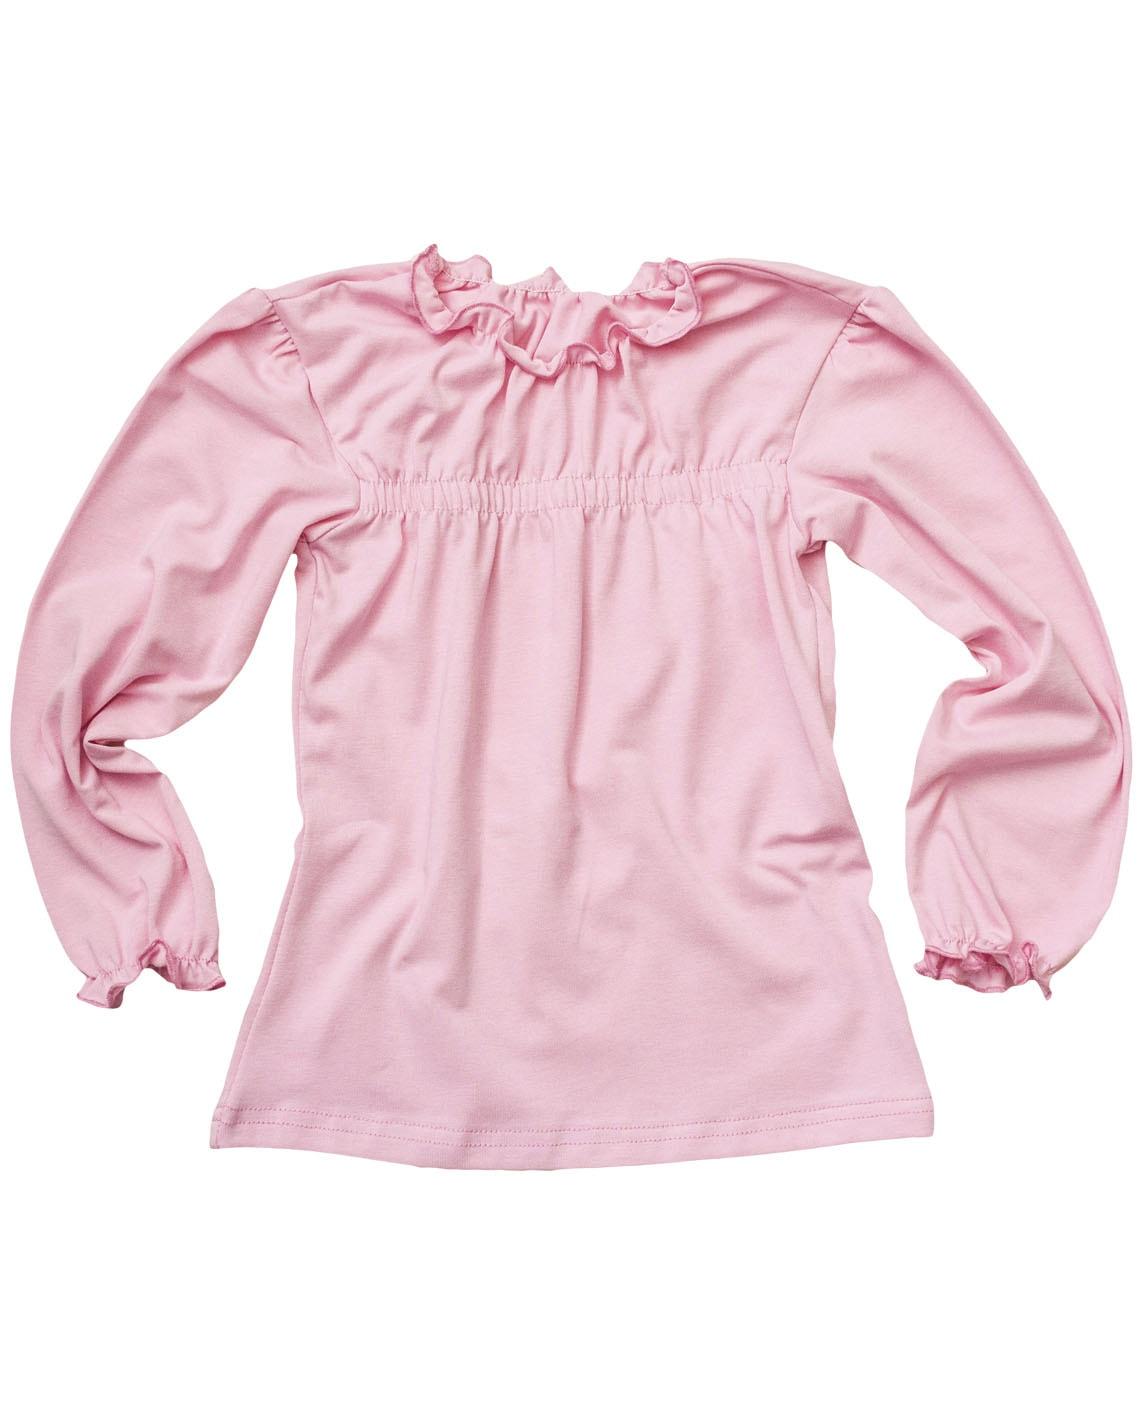 Блузка Девочки Розовая